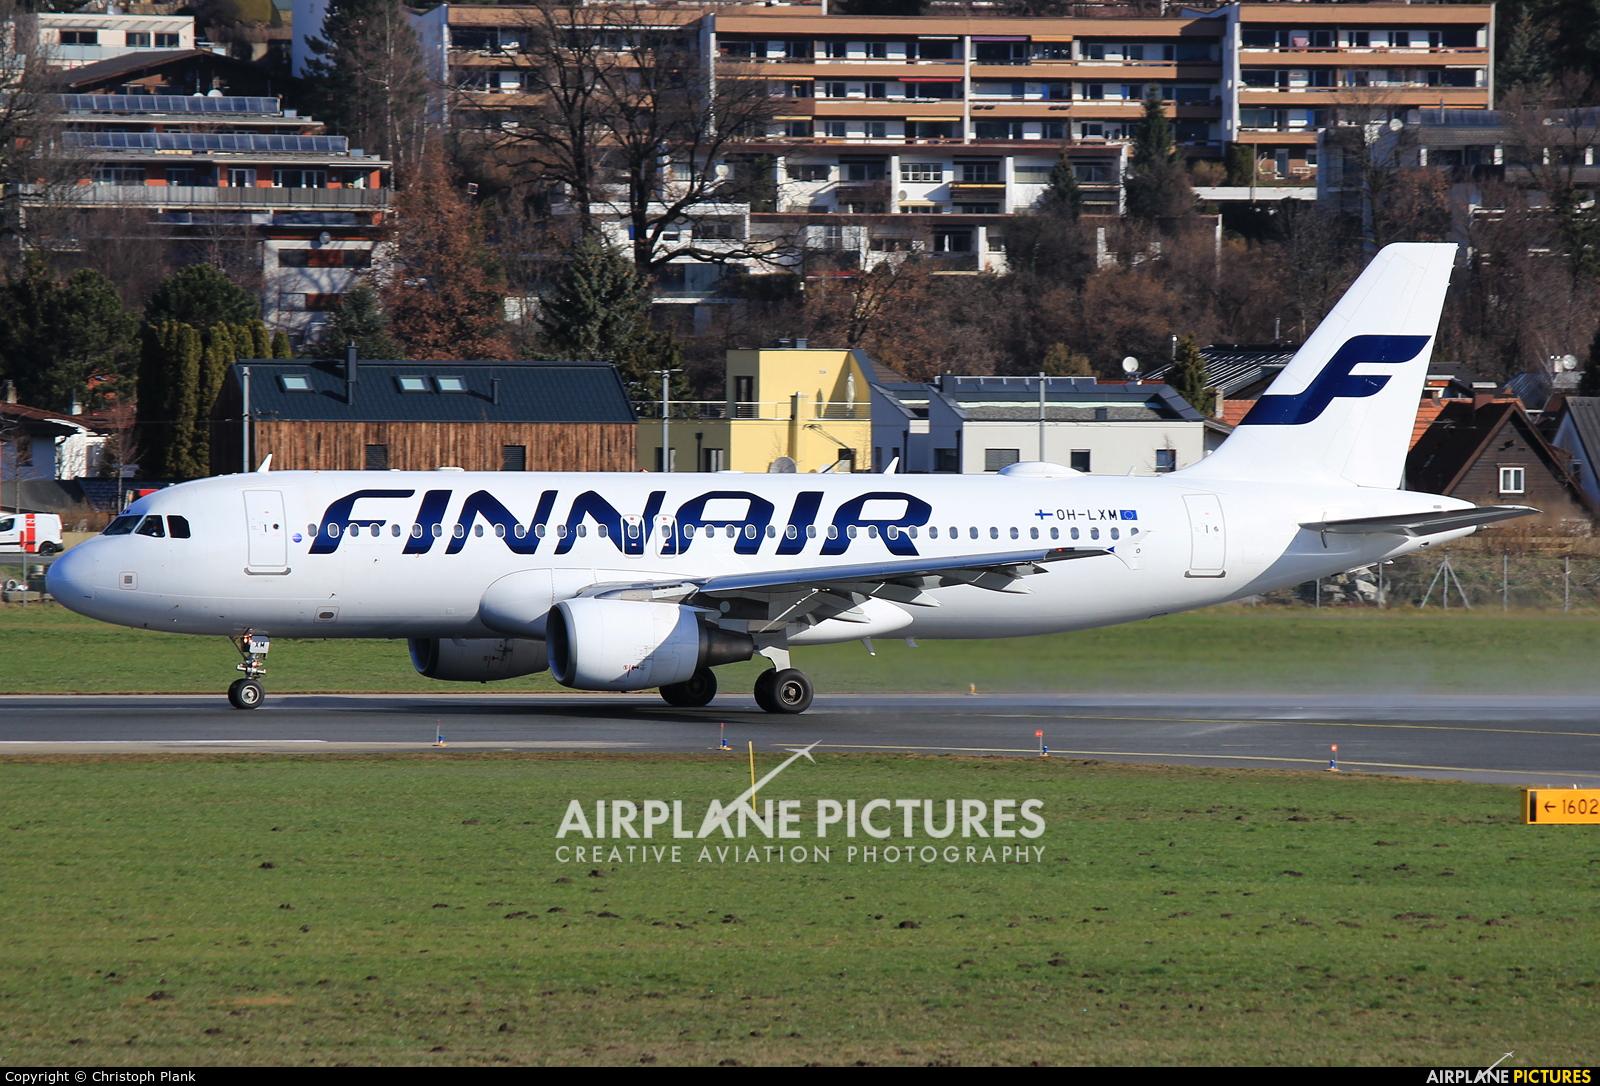 Finnair OH-LXM aircraft at Innsbruck